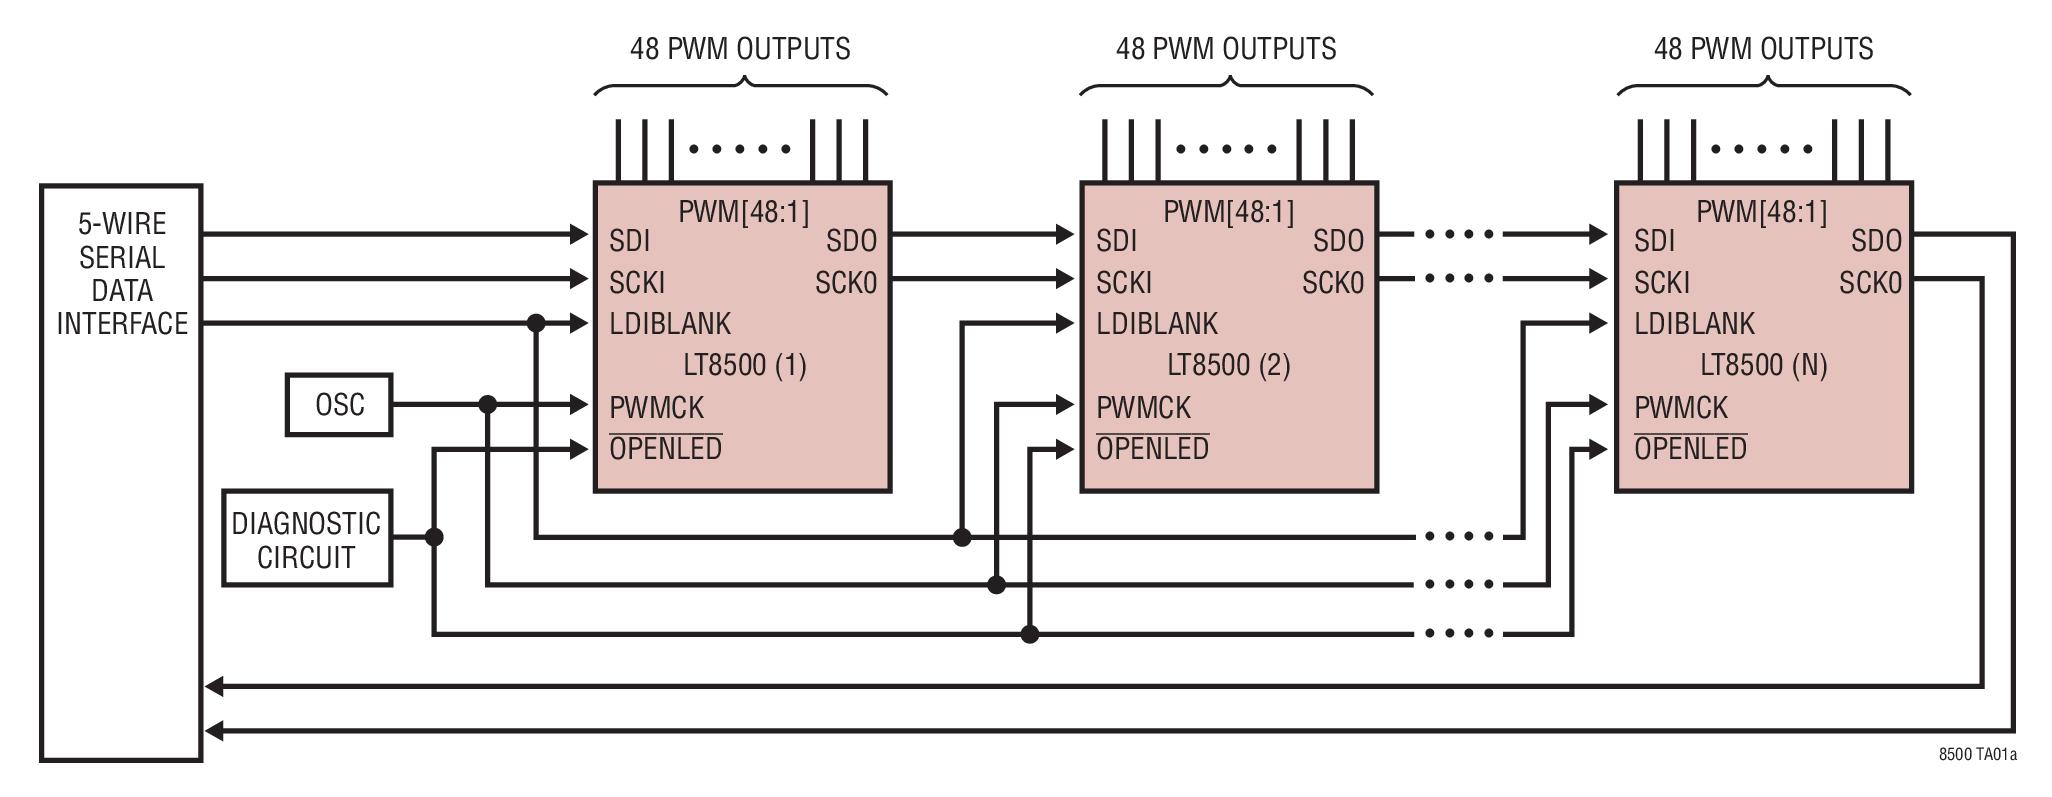 LT8500 具 12 位分辨率和 50MHz ...